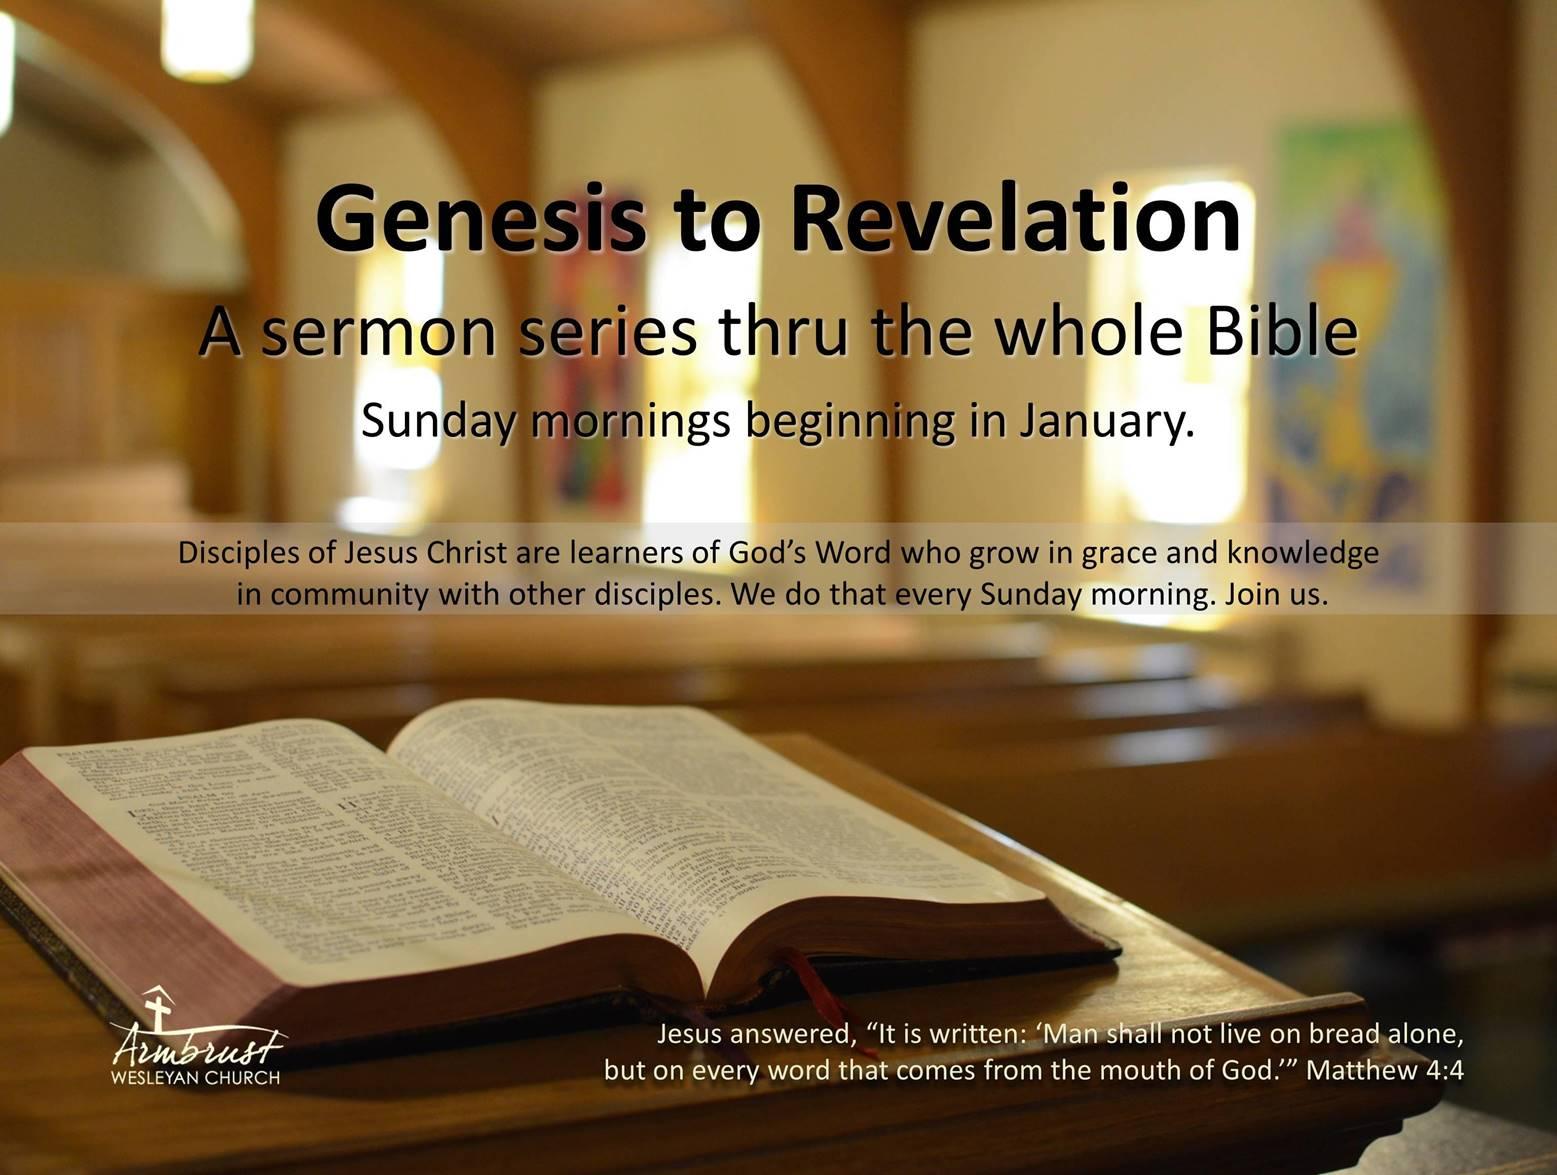 Gen to Rev title.jpg